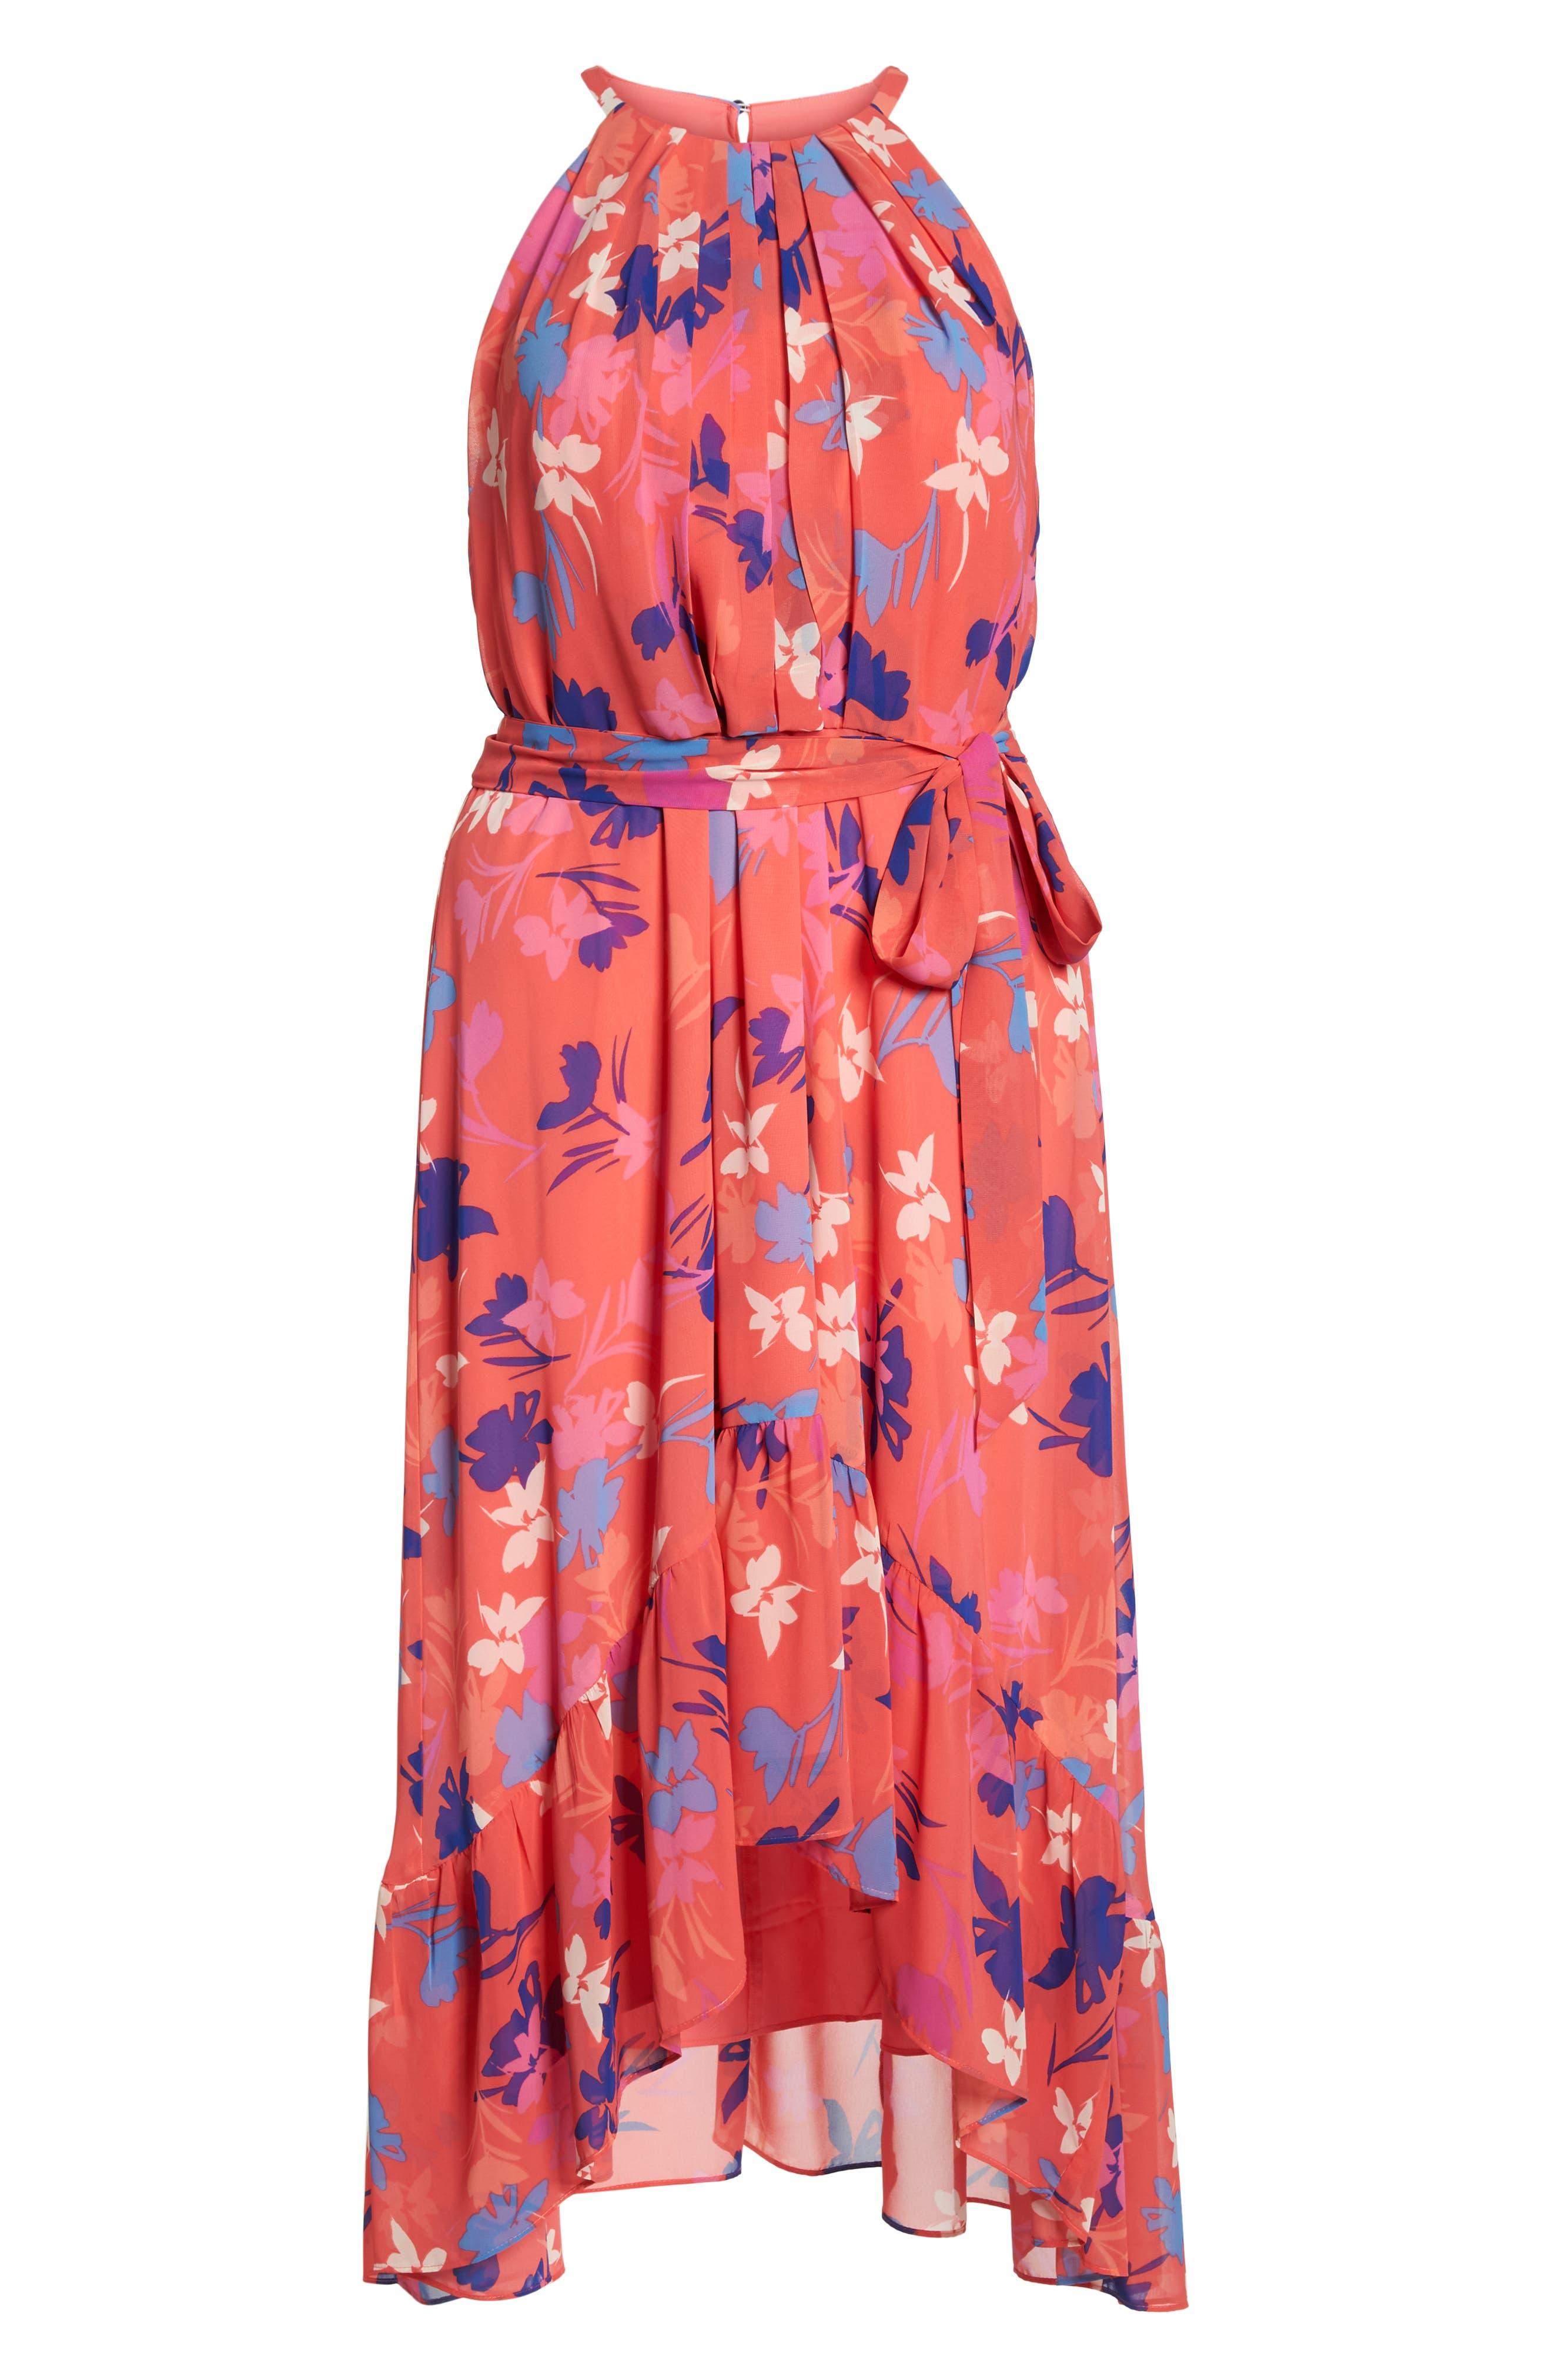 Floral High/Low Halter Dress,                             Alternate thumbnail 7, color,                             653